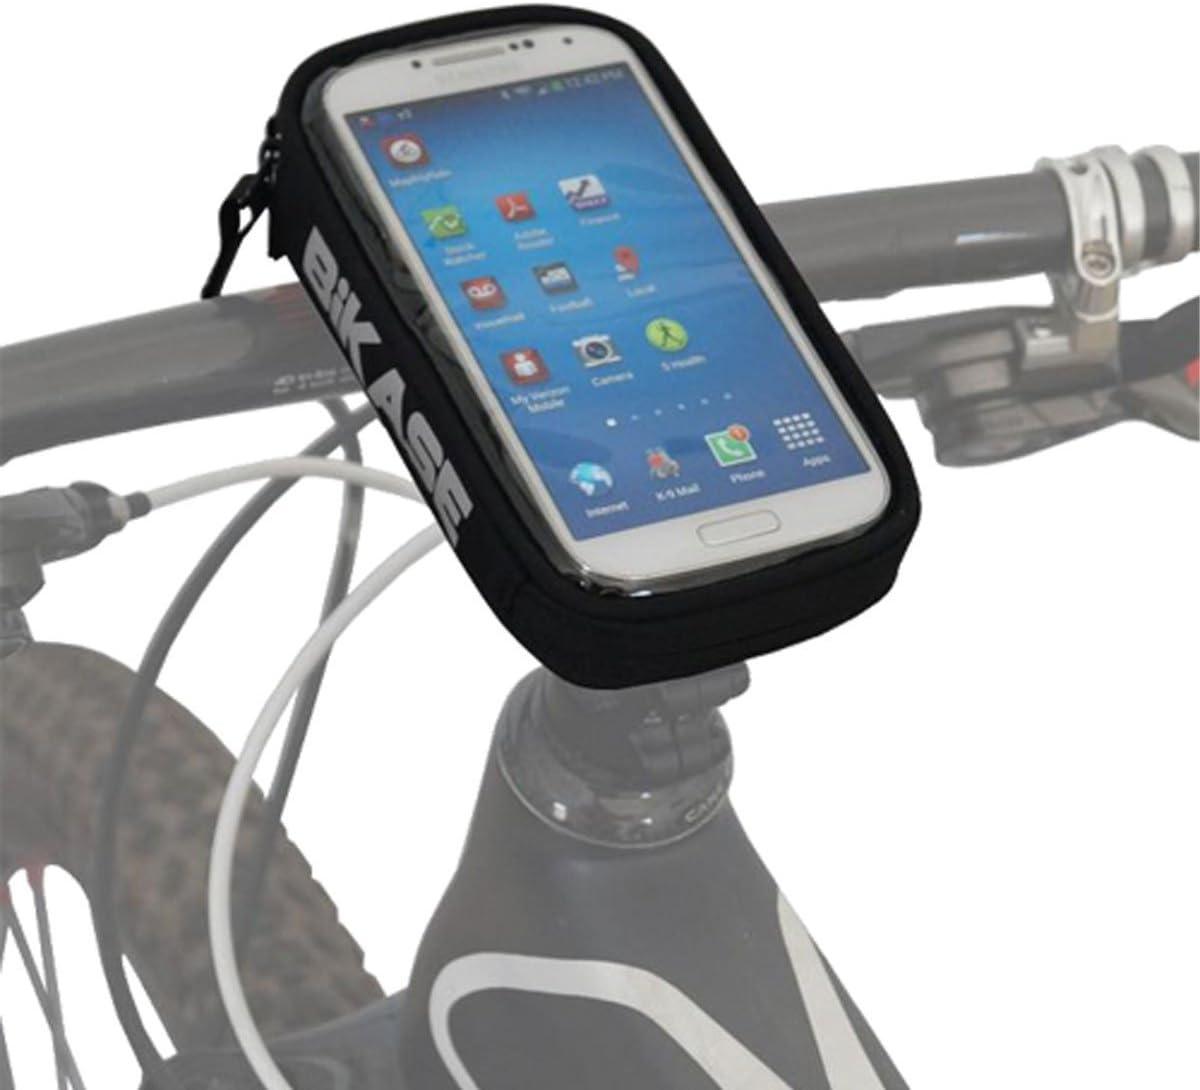 BiKase Handy Andy 6 Phone Holder